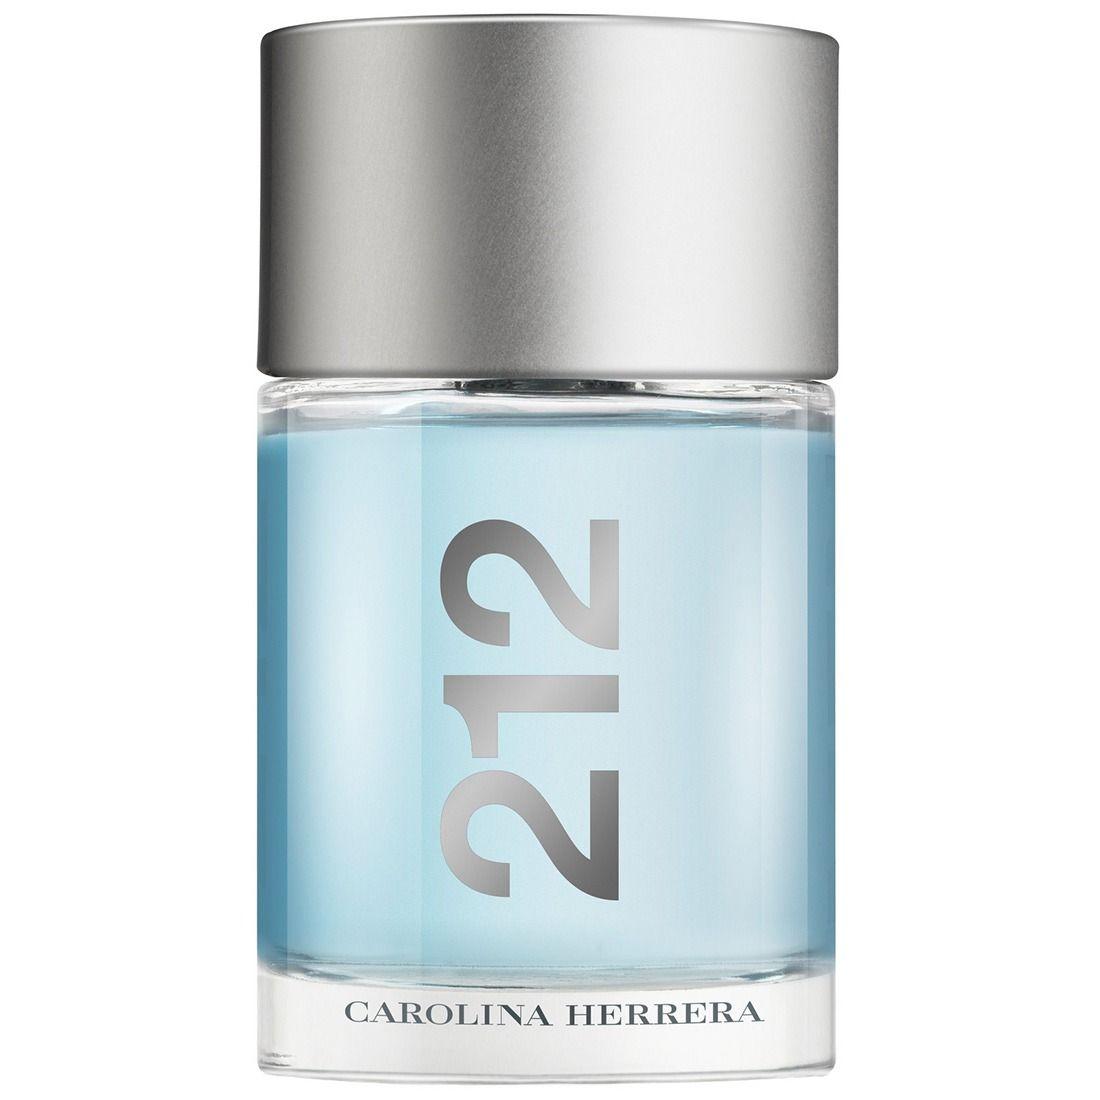 Carolina Herrera 212 Men NYC Aftershave Lotion 100ml